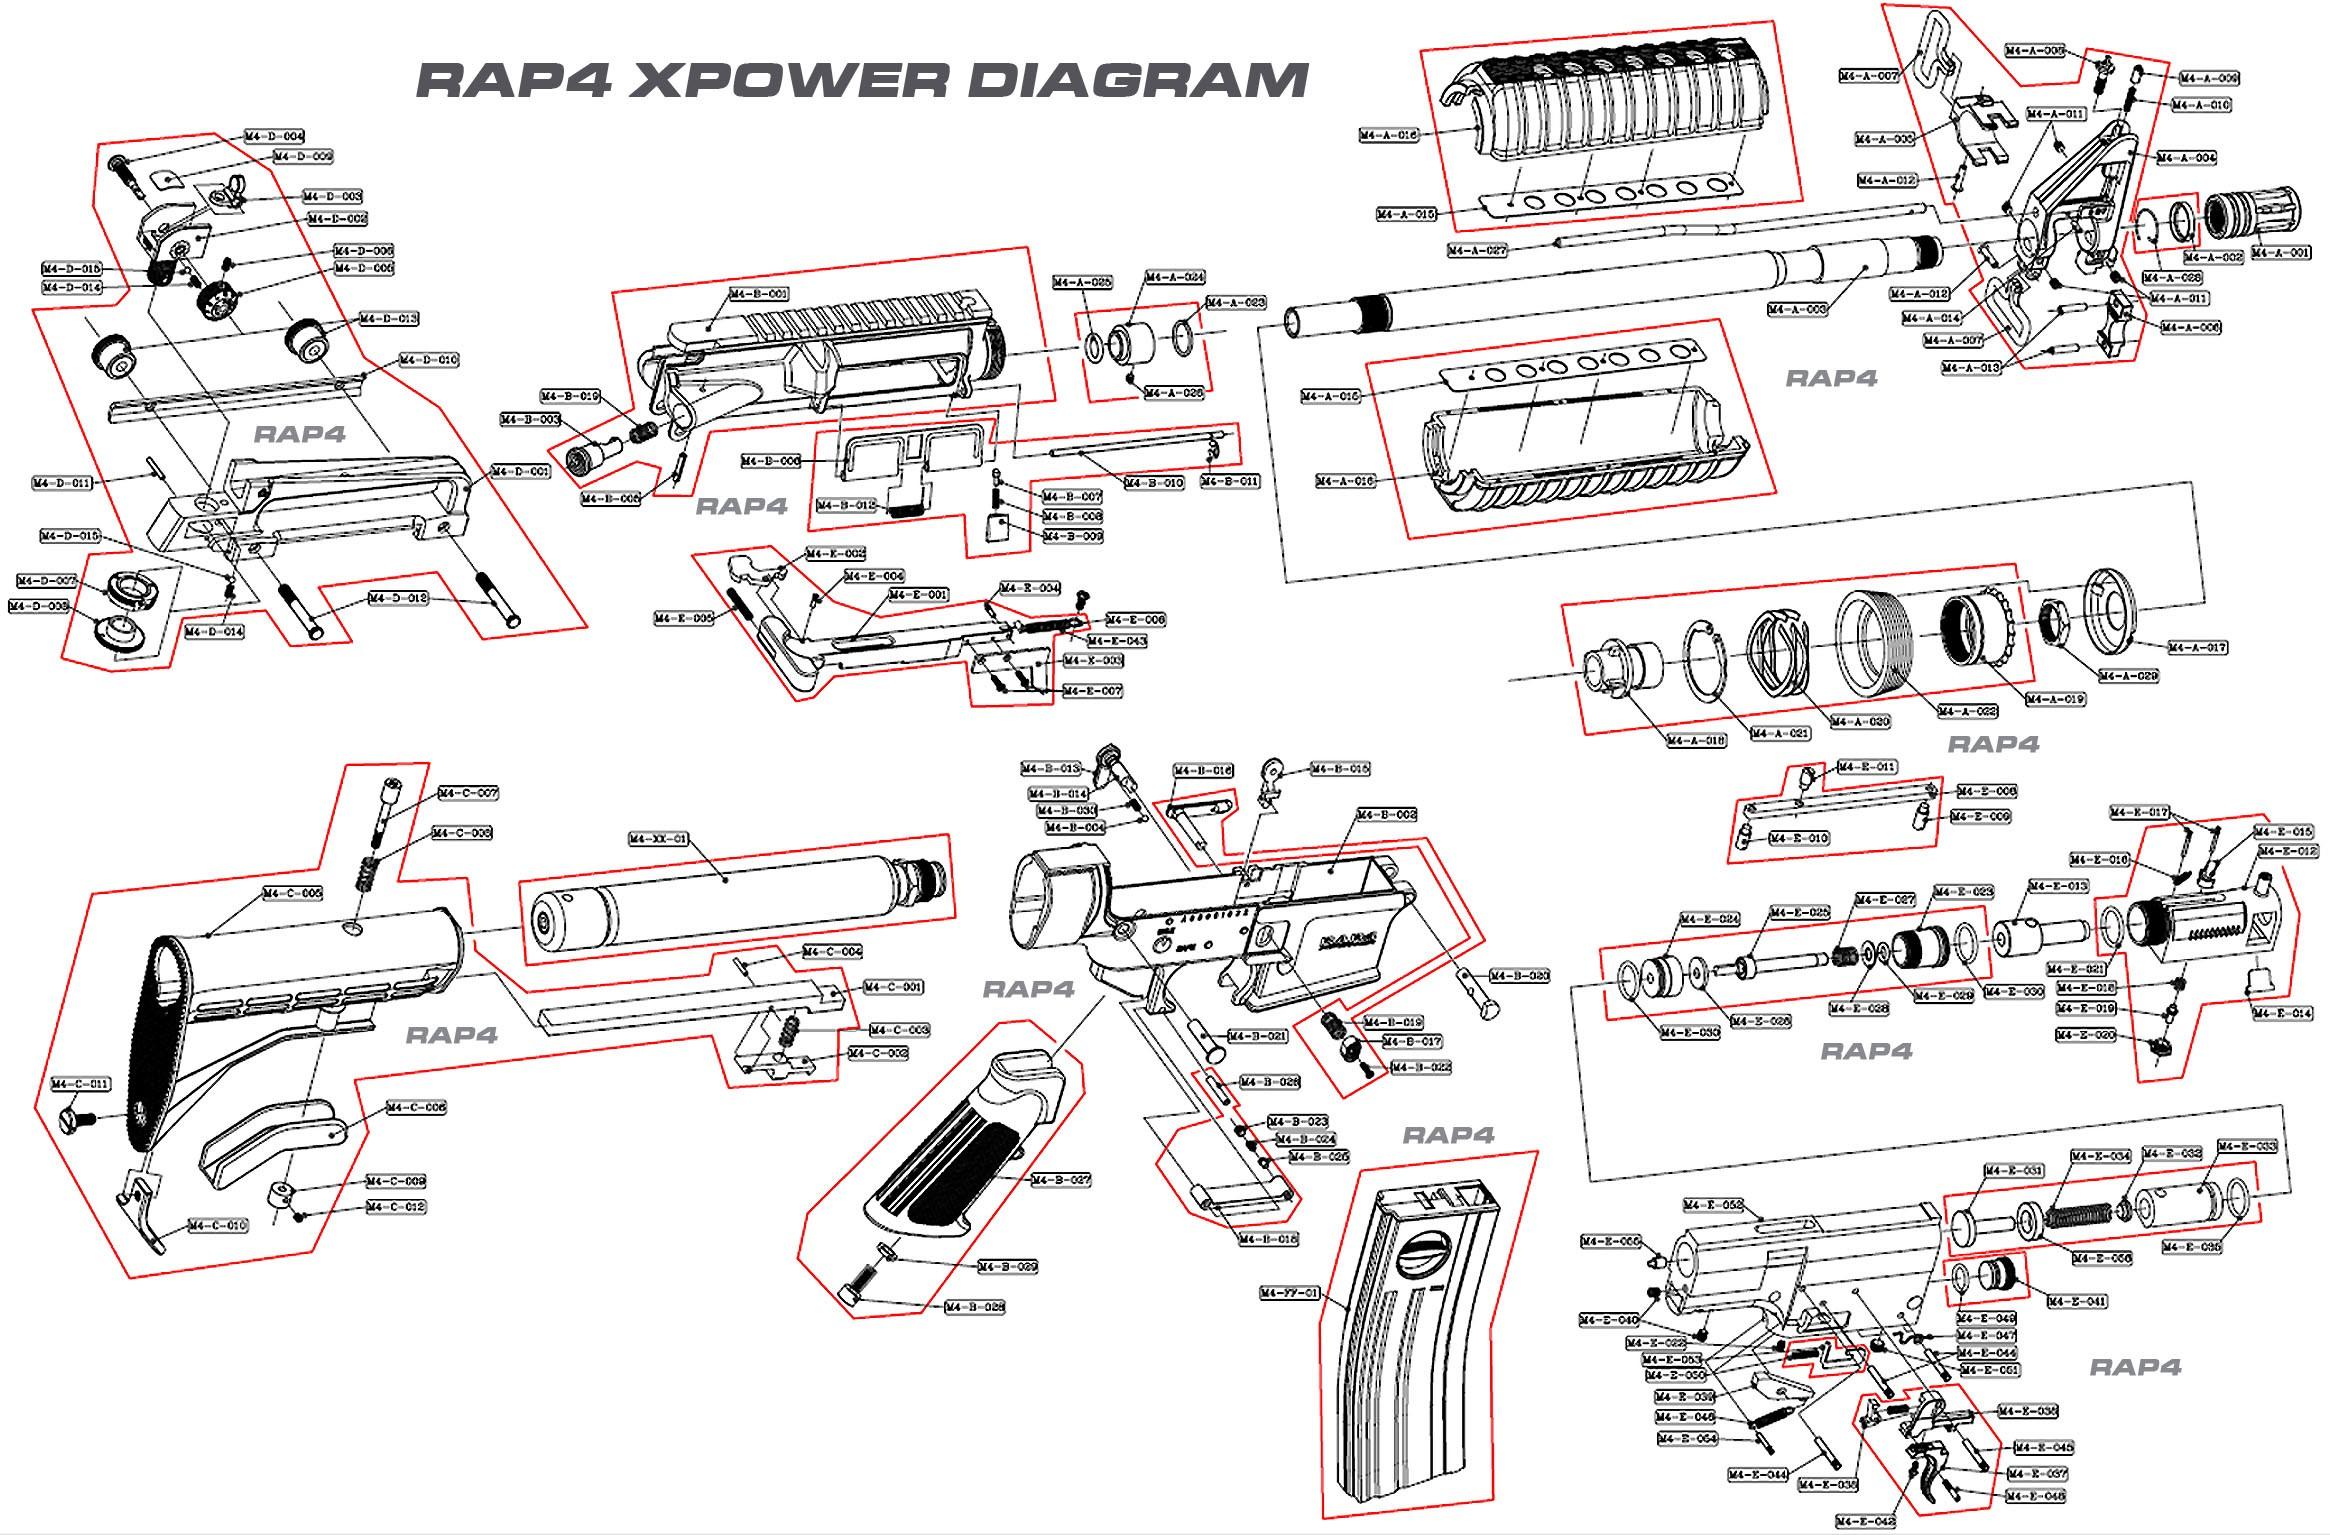 basic m4 parts diagram information of wiring diagram \u2022 m4 electric airsoft rifle basic m4 parts diagram information of wiring diagram u2022 rh infowiring today airsoft m4 parts layout m4 carbine parts